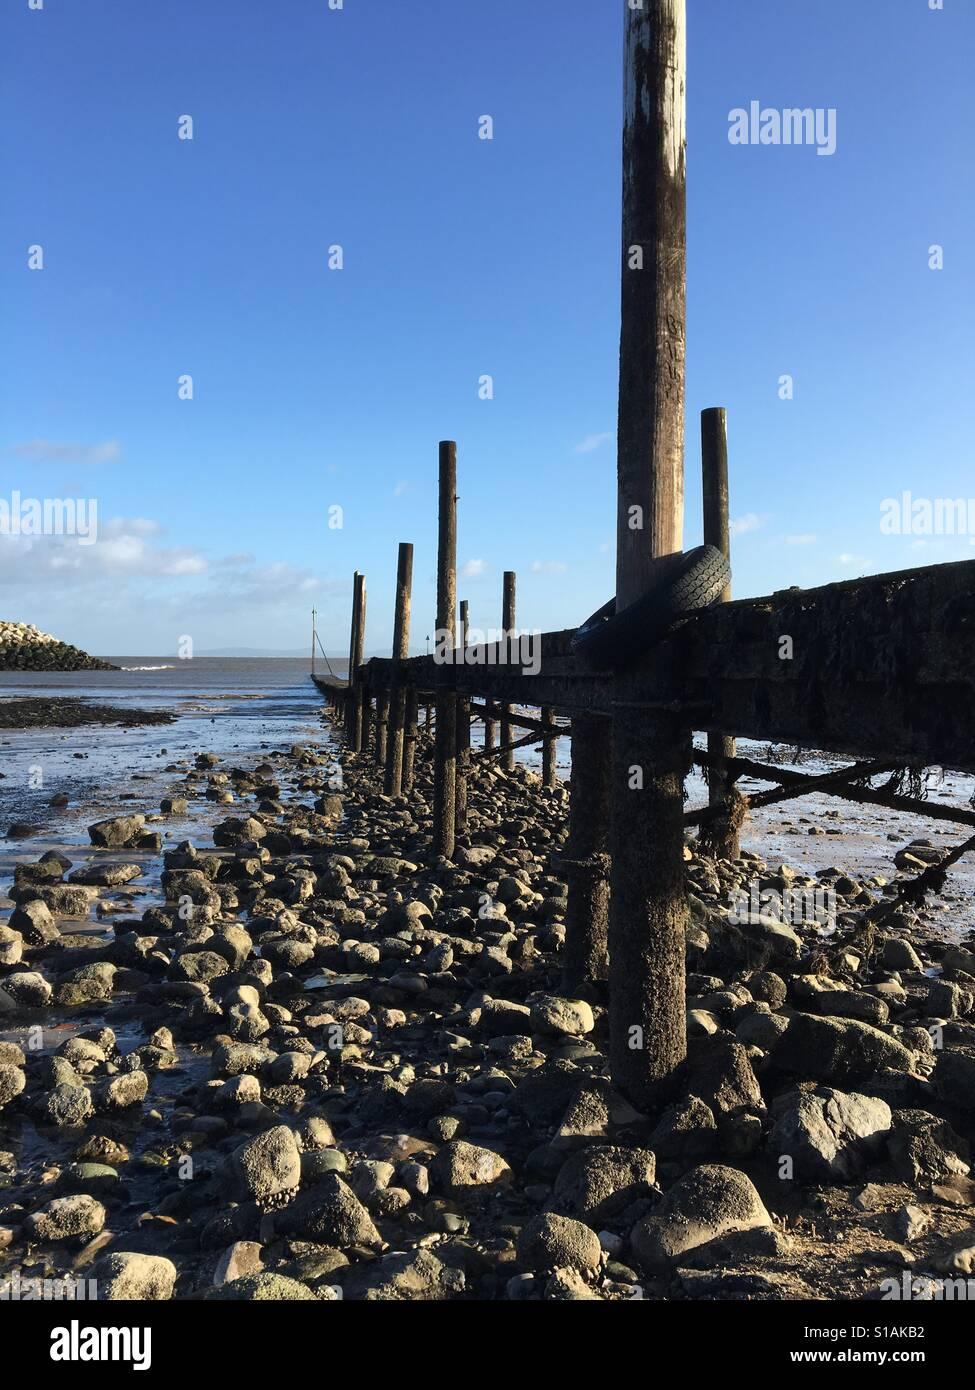 Rhos On Sea Promenade, North Wales - Stock Image